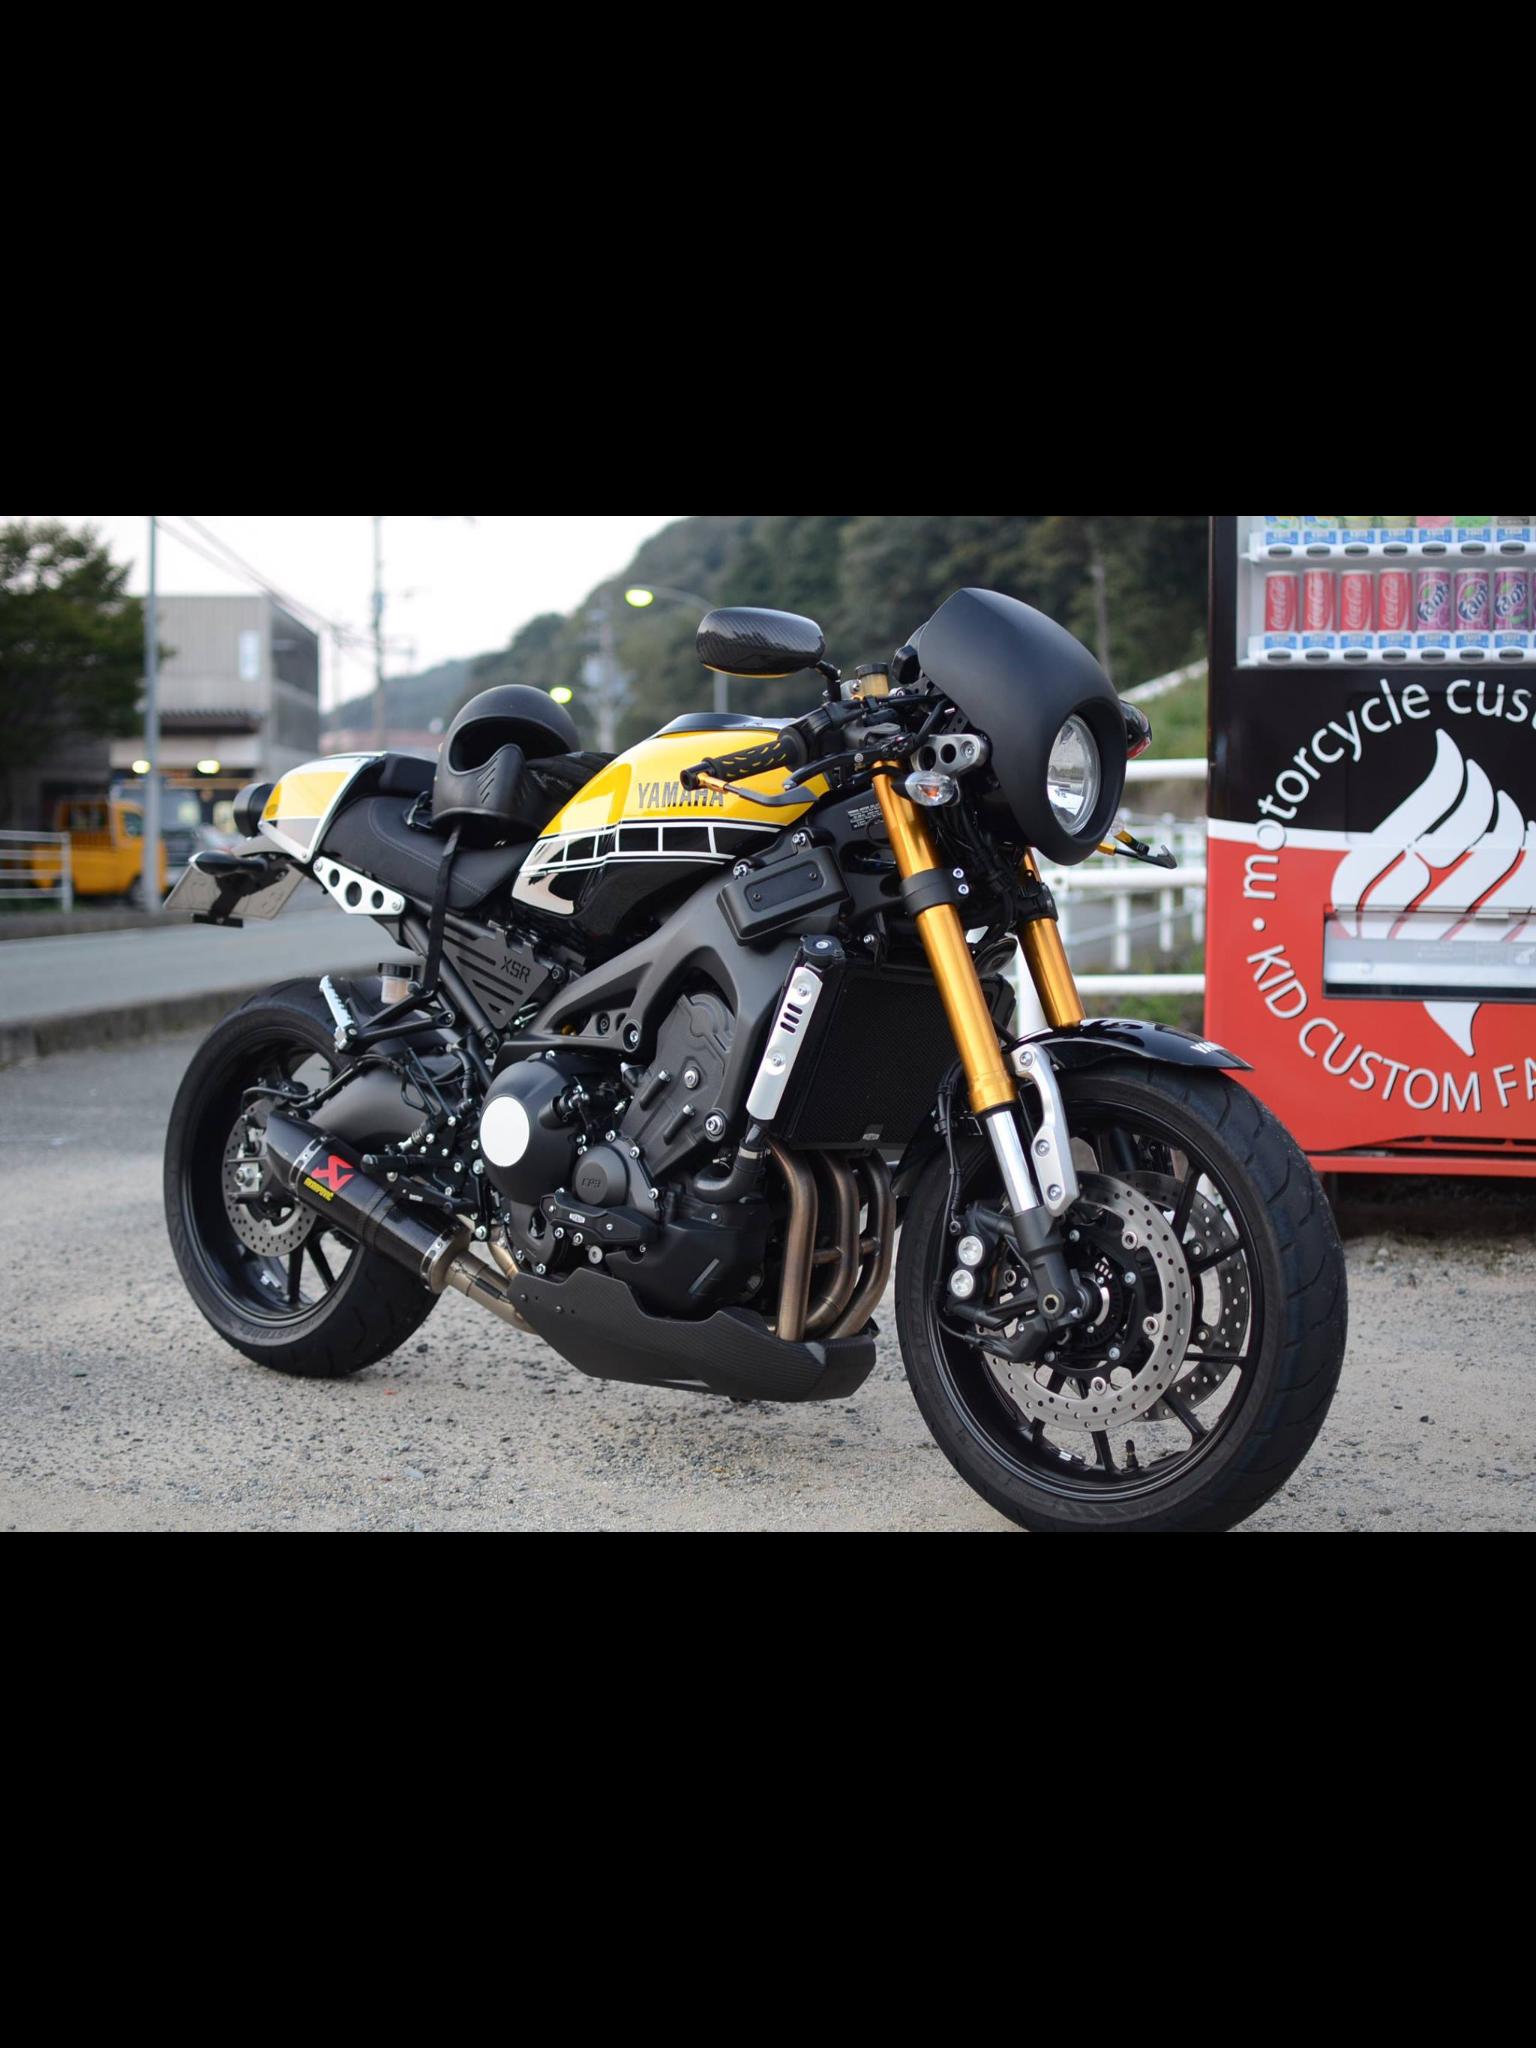 Moto yamaha scrambler cars motorcycles bobber forward mt09 yamaha - Yellow Motorcycle Gear Bike Ideas Caf Racers Dreams Sweet Life Motors Motorbikes